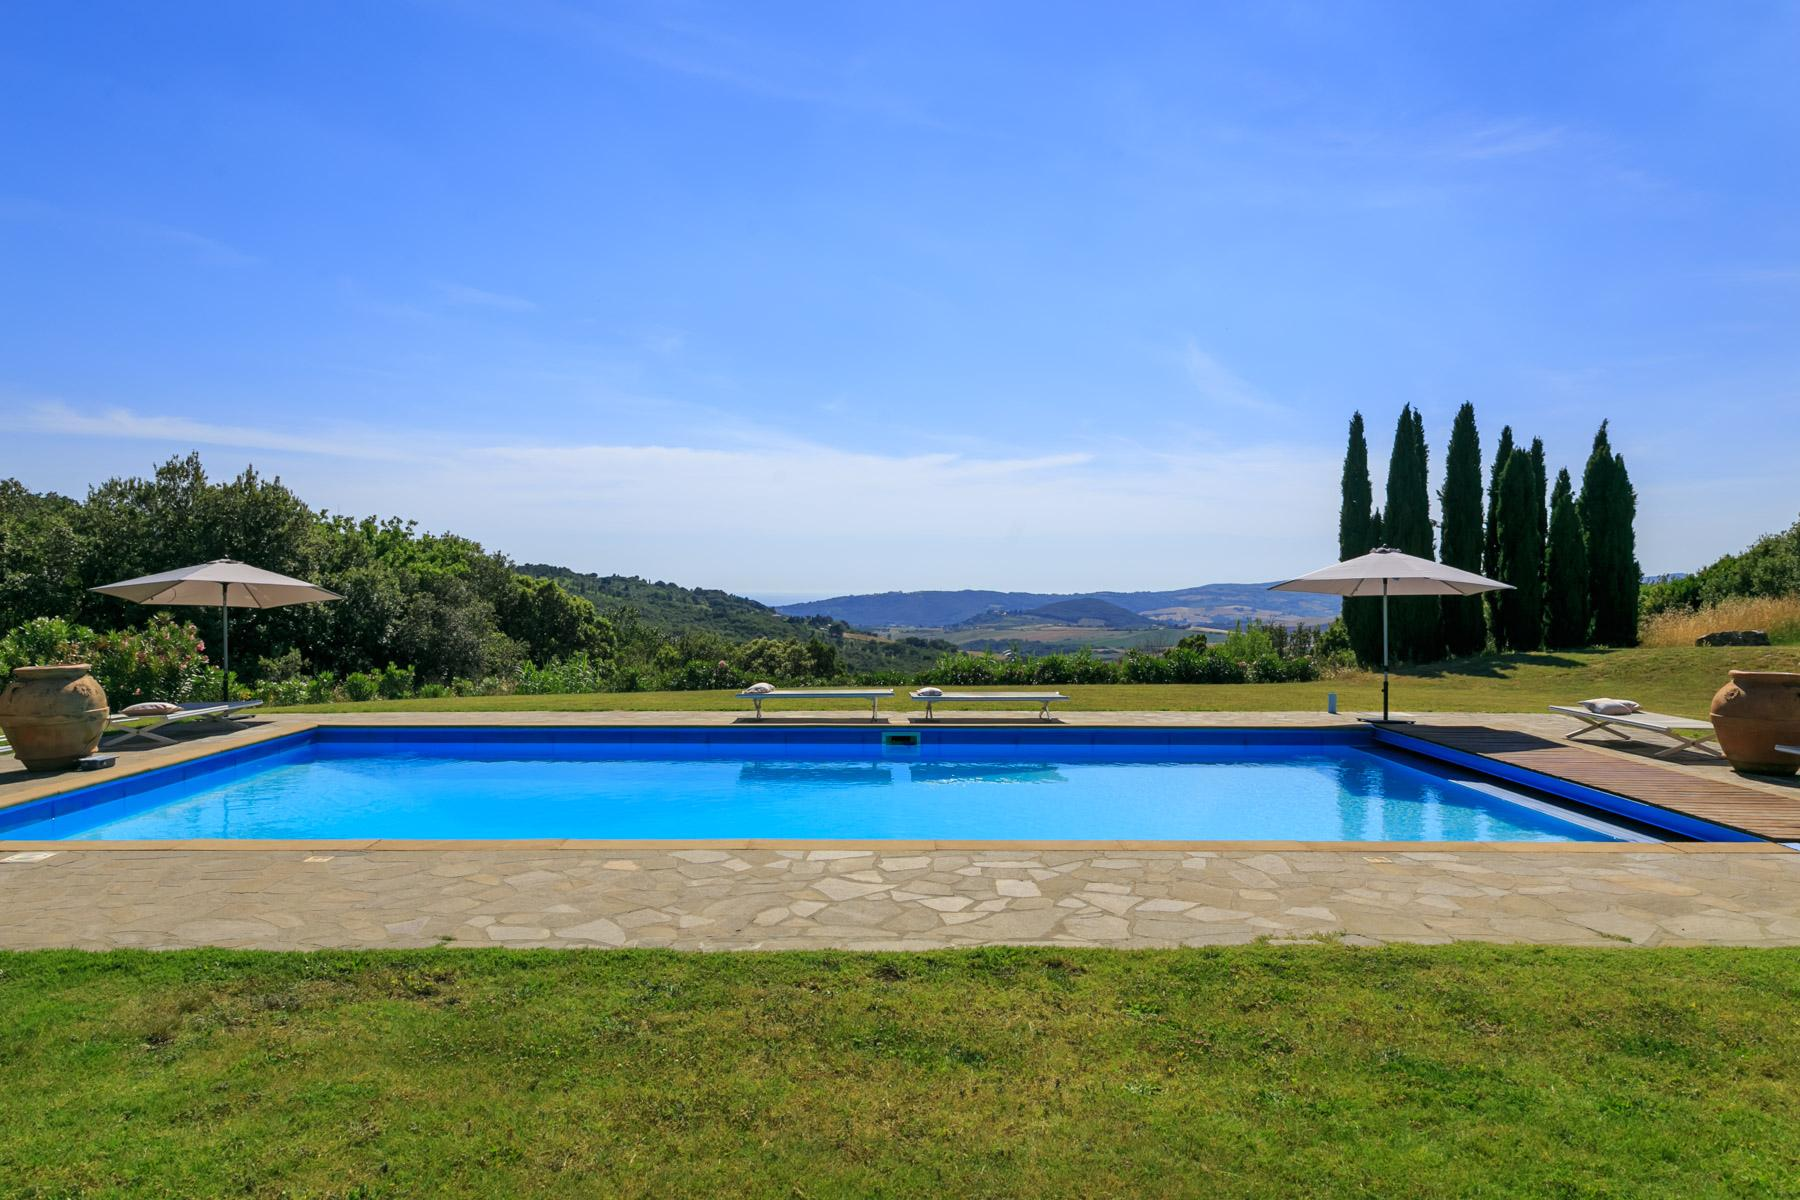 Belle villa toscane avec piscine - 6